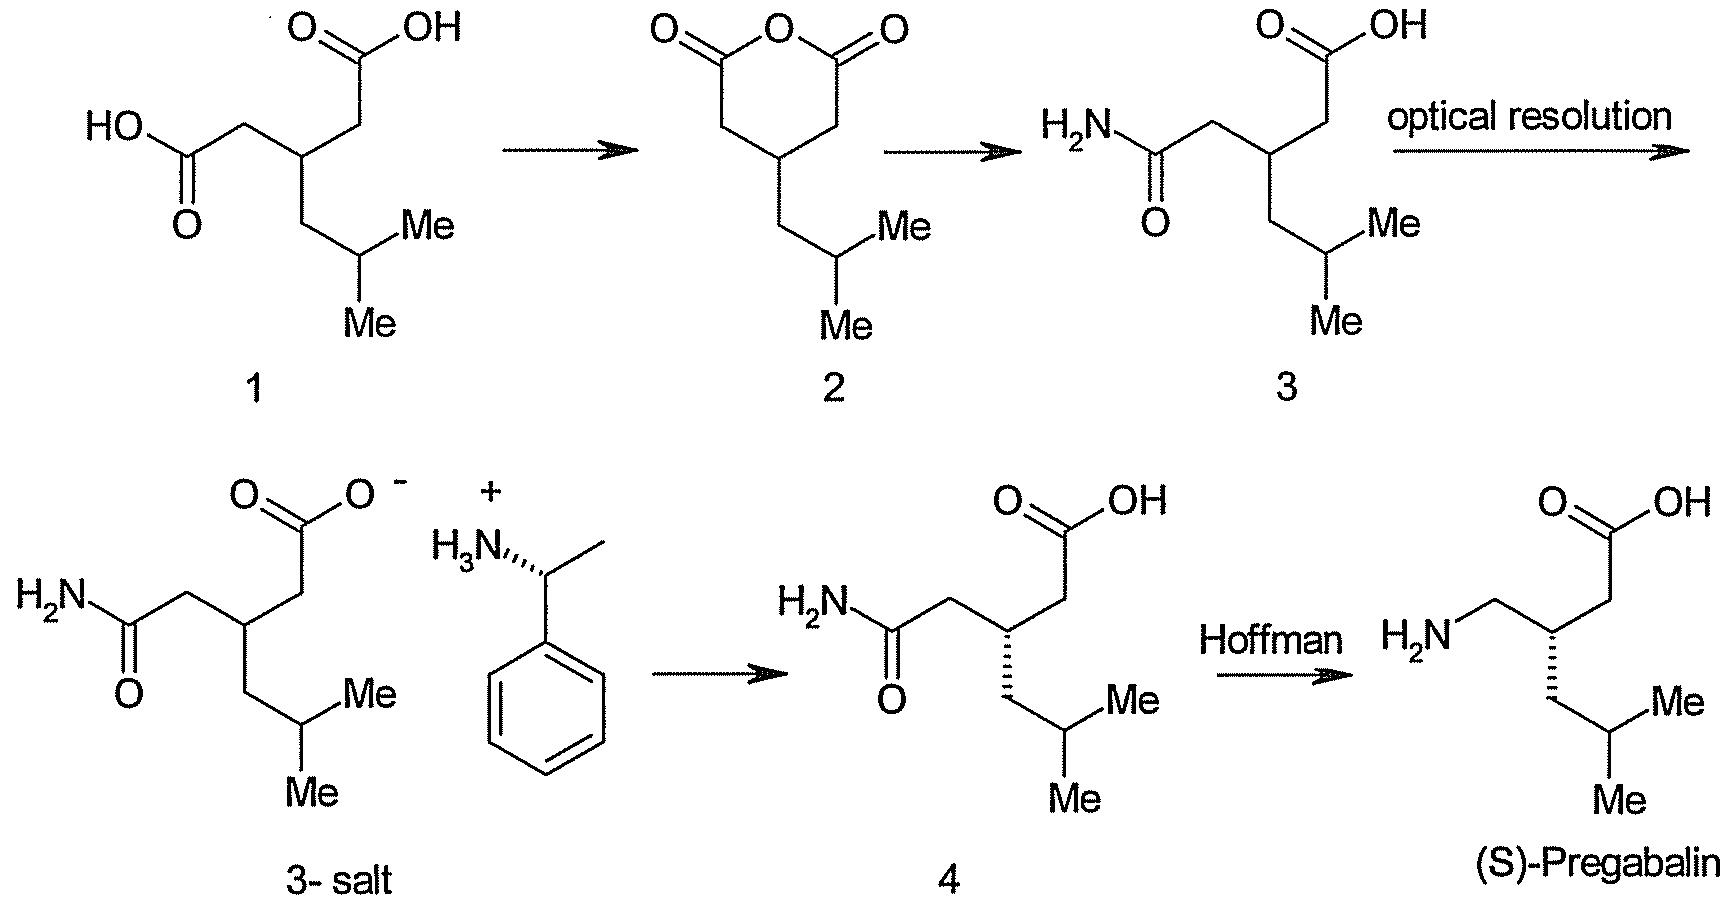 amine amide impurity pregabalin side